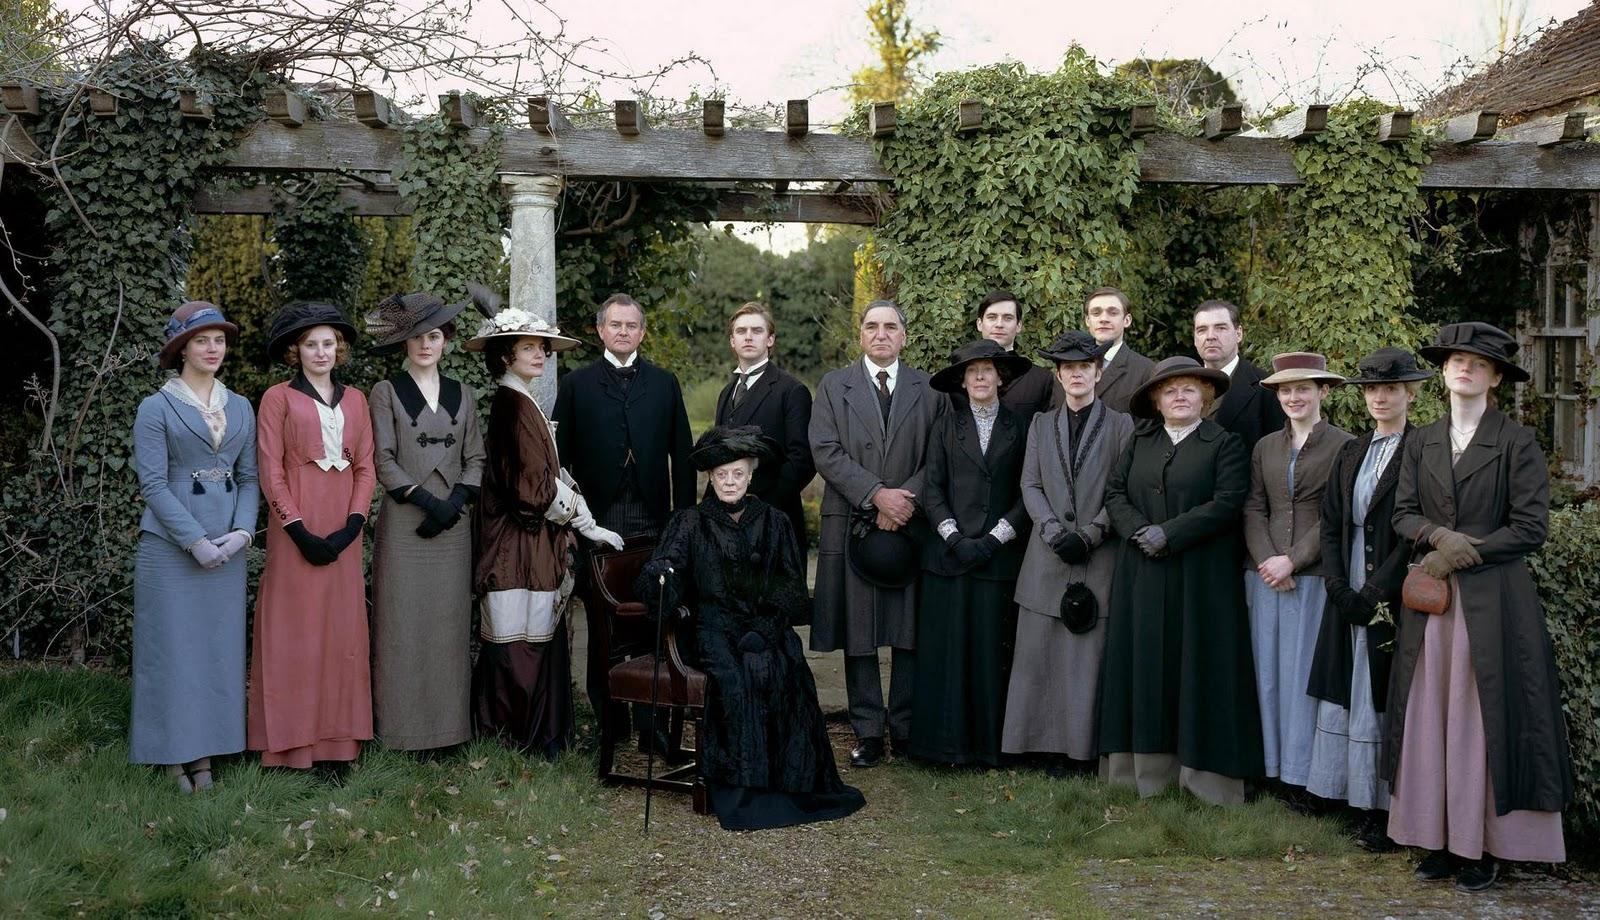 http://2.bp.blogspot.com/-mwlwLuRUCO8/Tnby2r9CPPI/AAAAAAAALiA/QUVgzWDp_1I/s1600/Downton-Abbey-period-films-15626885-1896-1090.jpg